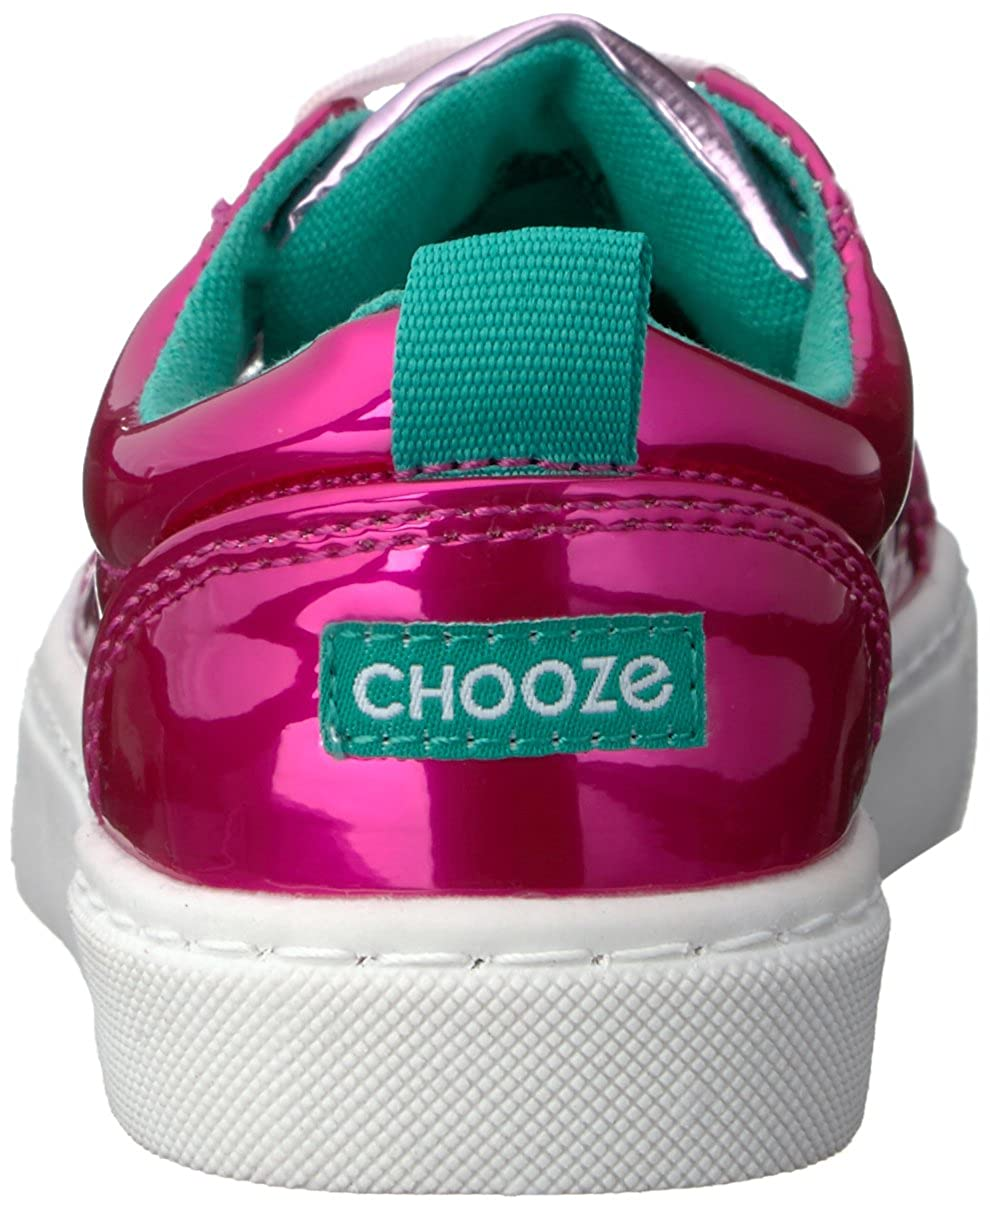 K CHOOZE Big Choice Sneaker Big Choice